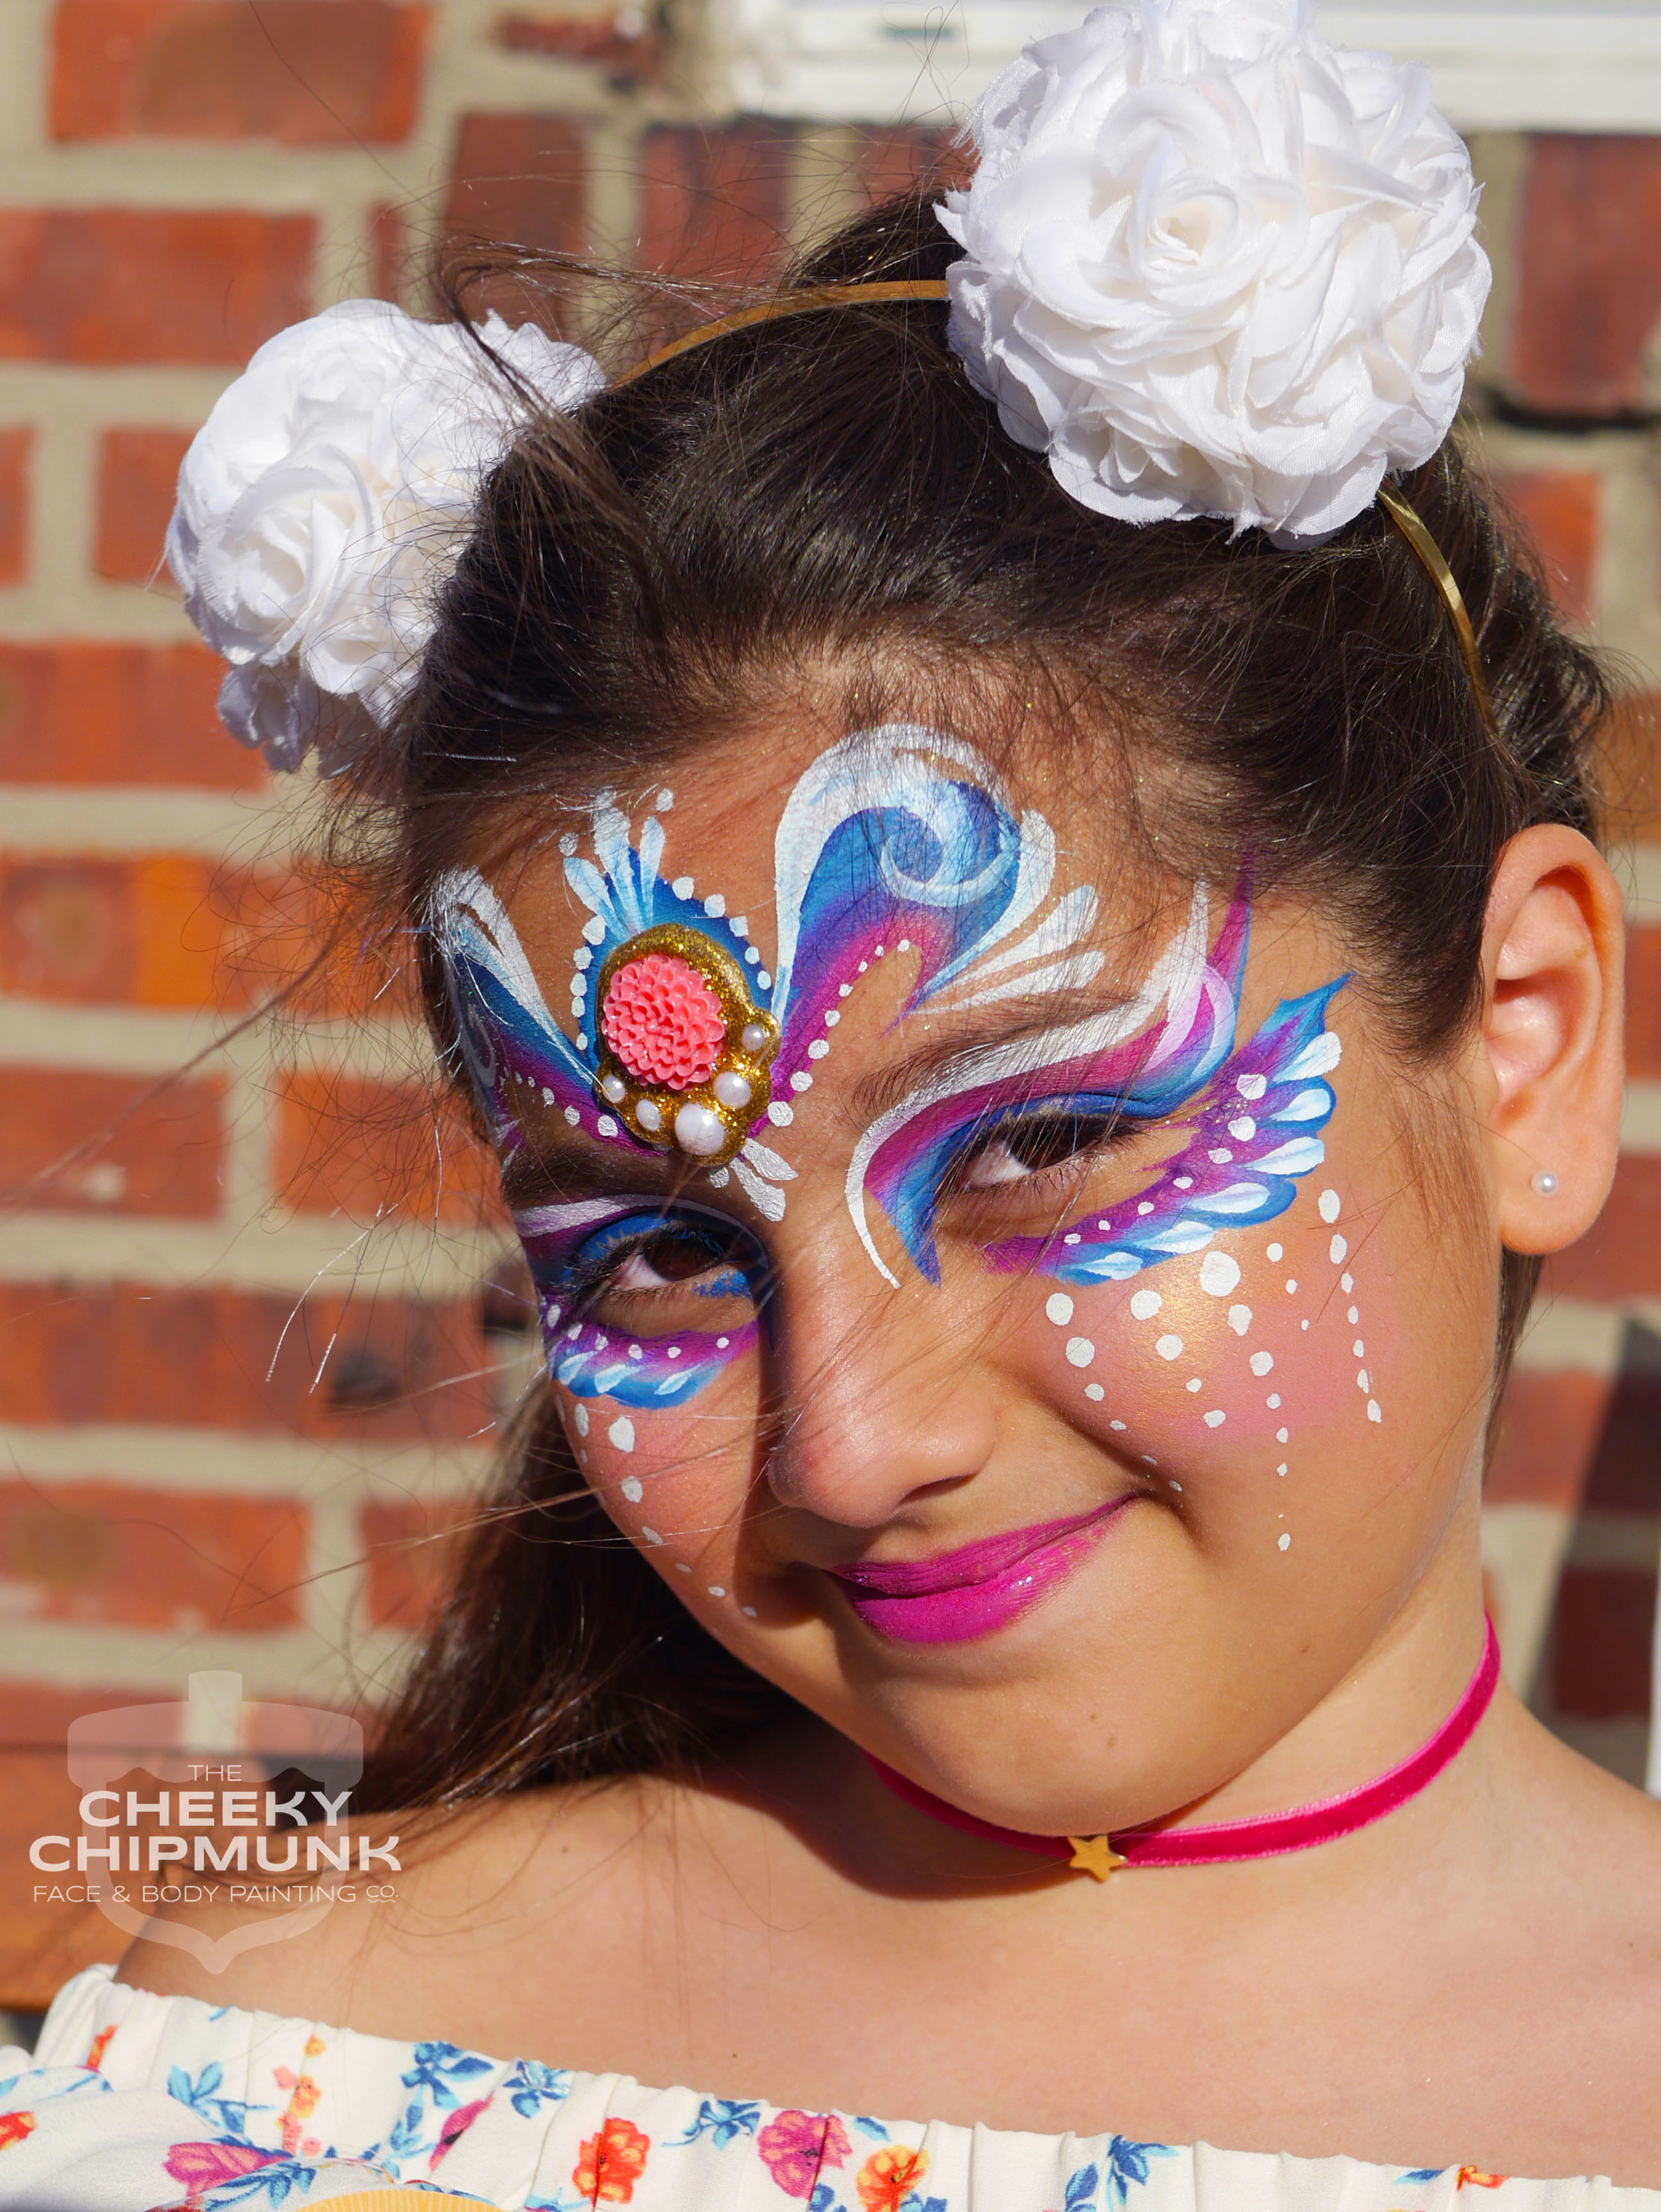 Princess_lenorekoppelman_thecheekychipmunk_frankie_birthday_party_leia.jpg